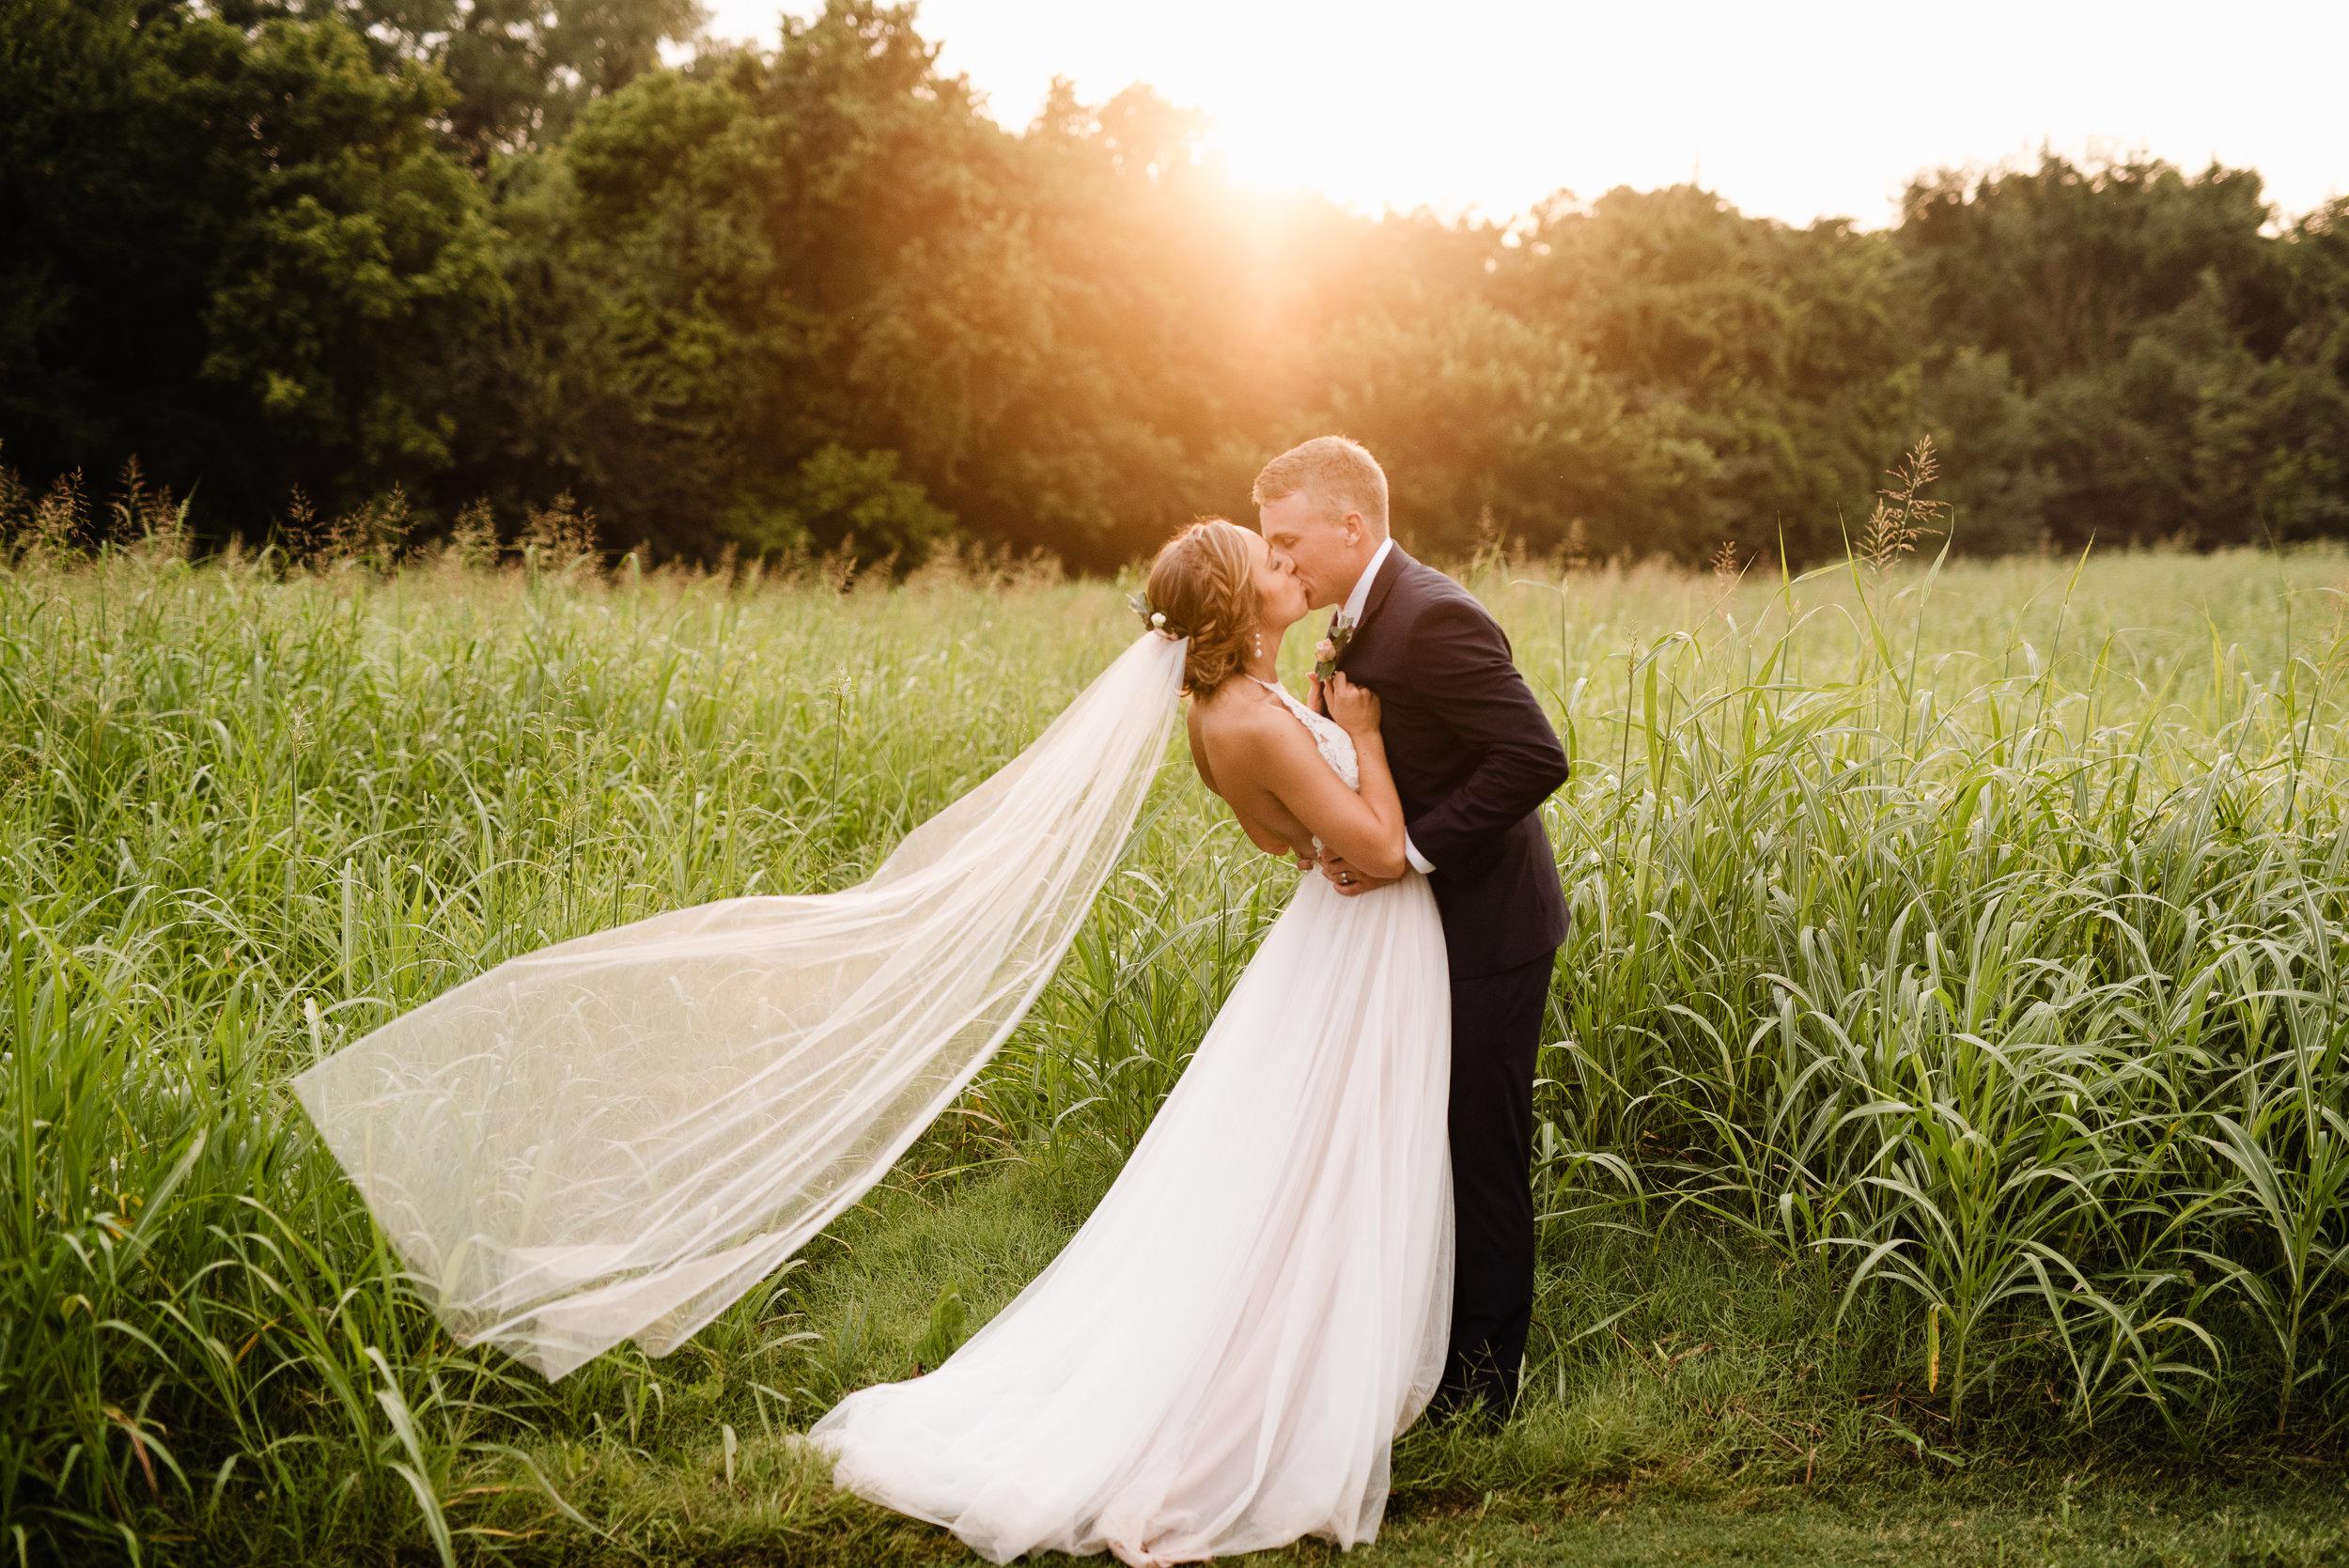 oklahoma wedding photographer bride groom wedding day outside the springs edmond sunset veil wedding day field